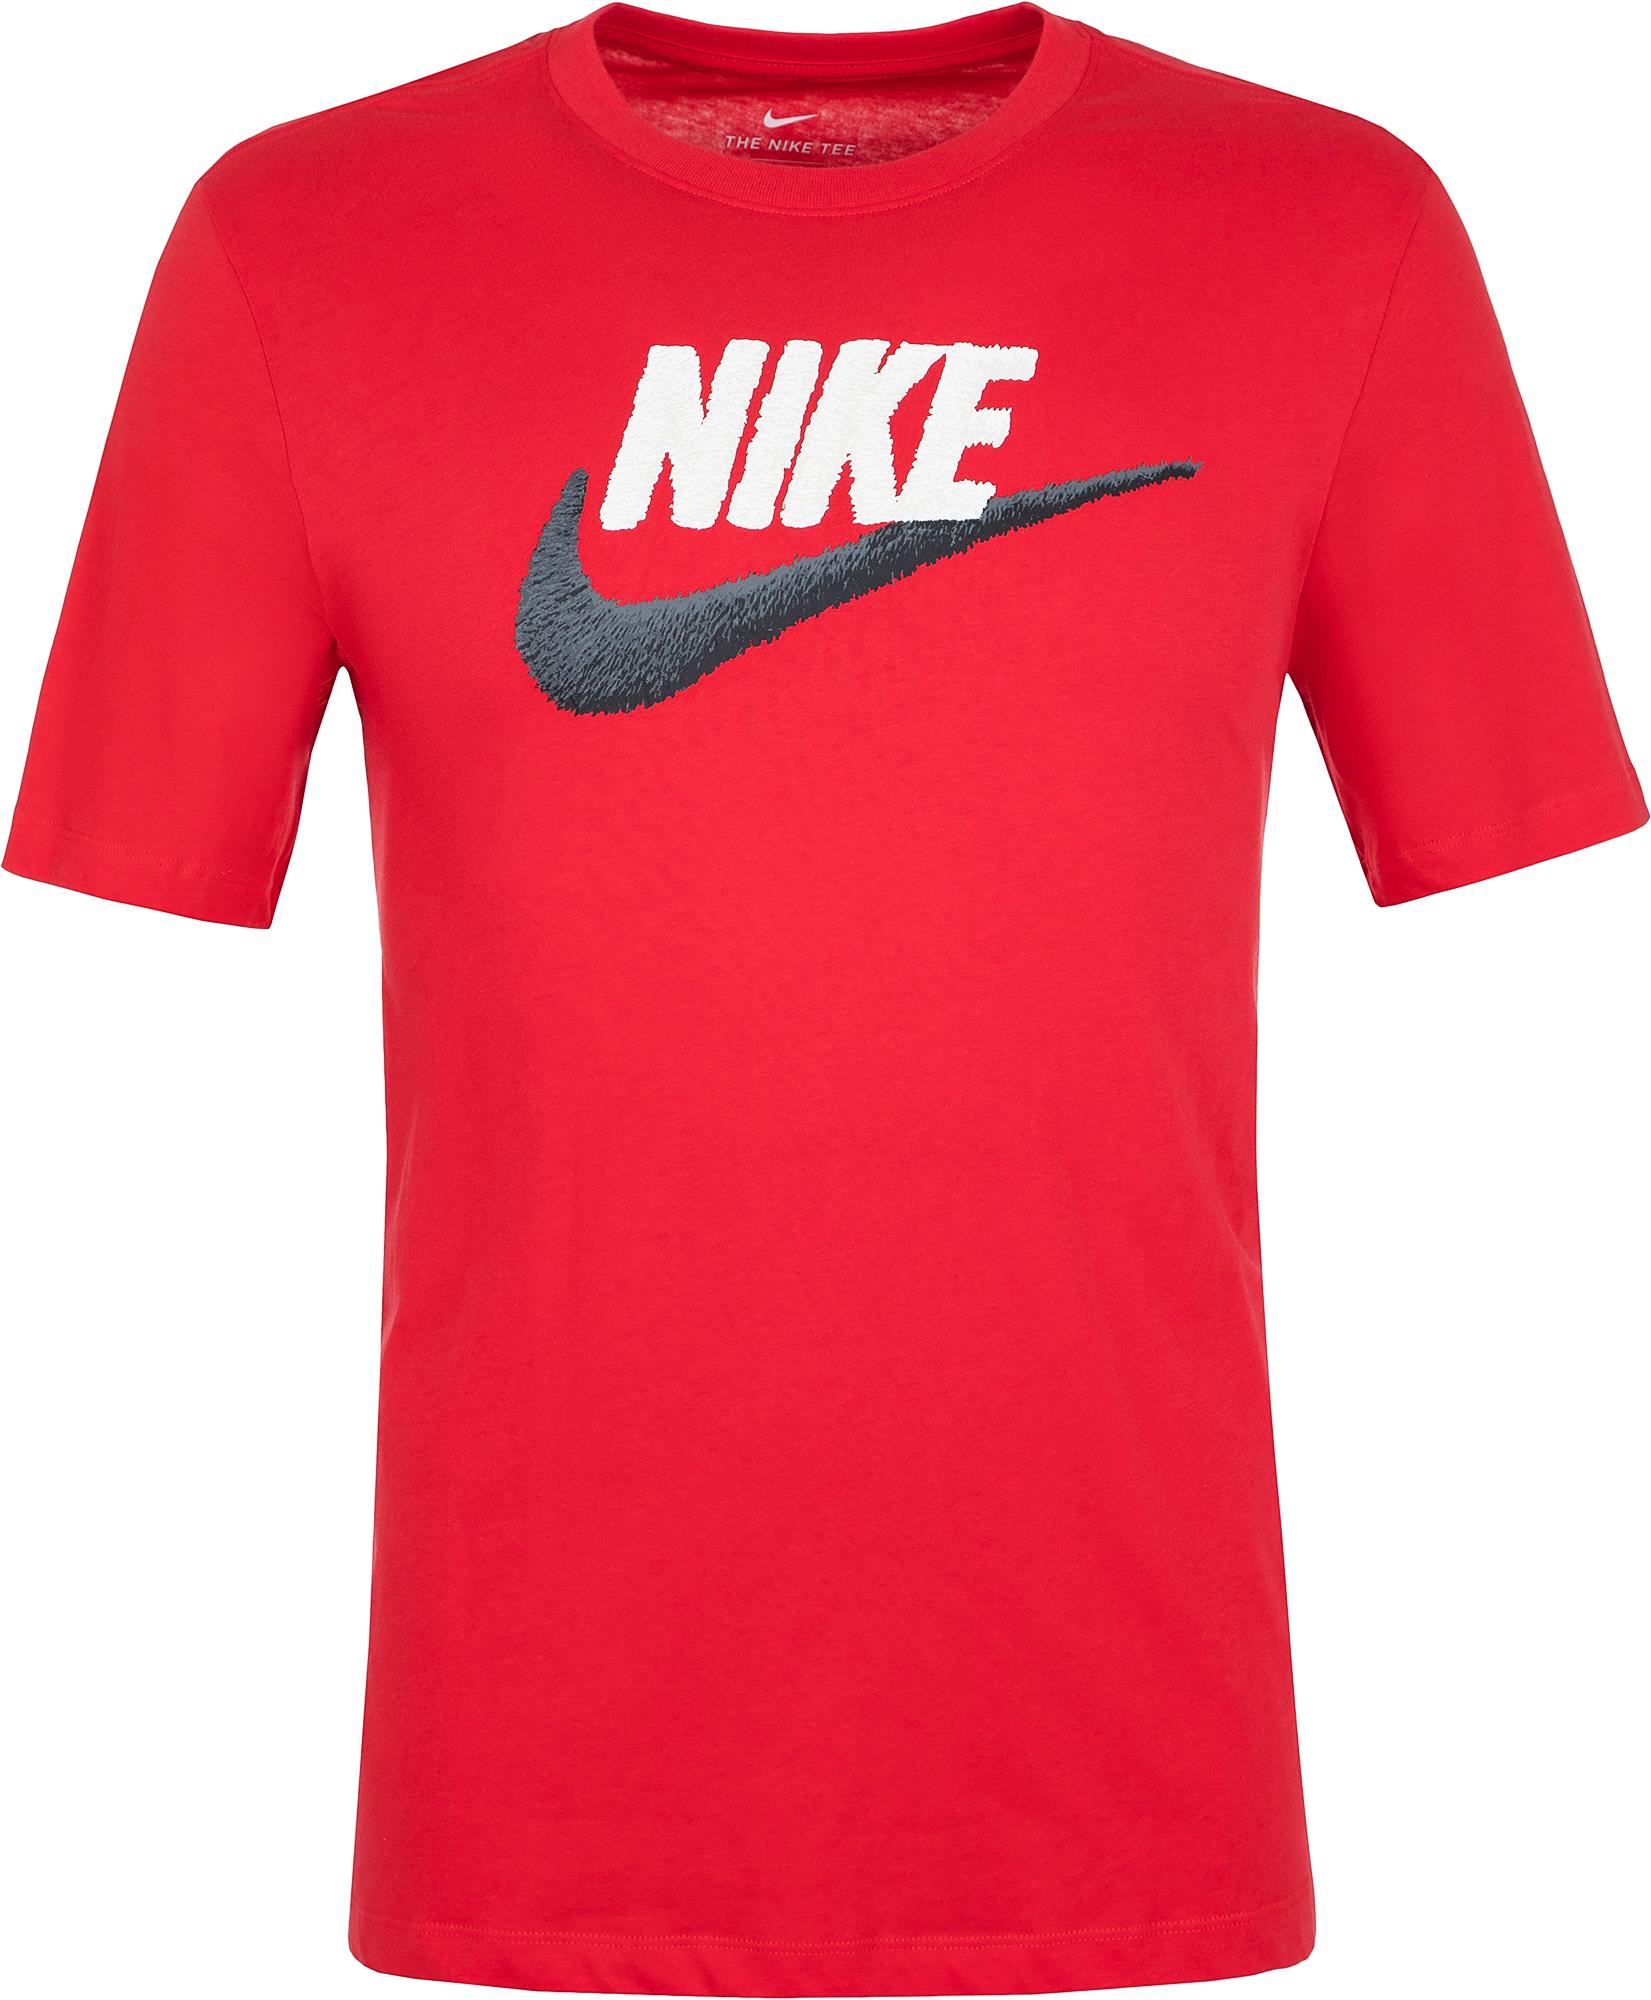 Nike Футболка мужская Nike Sportswear, размер 46-48 nike ветровка мужская nike nk essntl размер 46 48